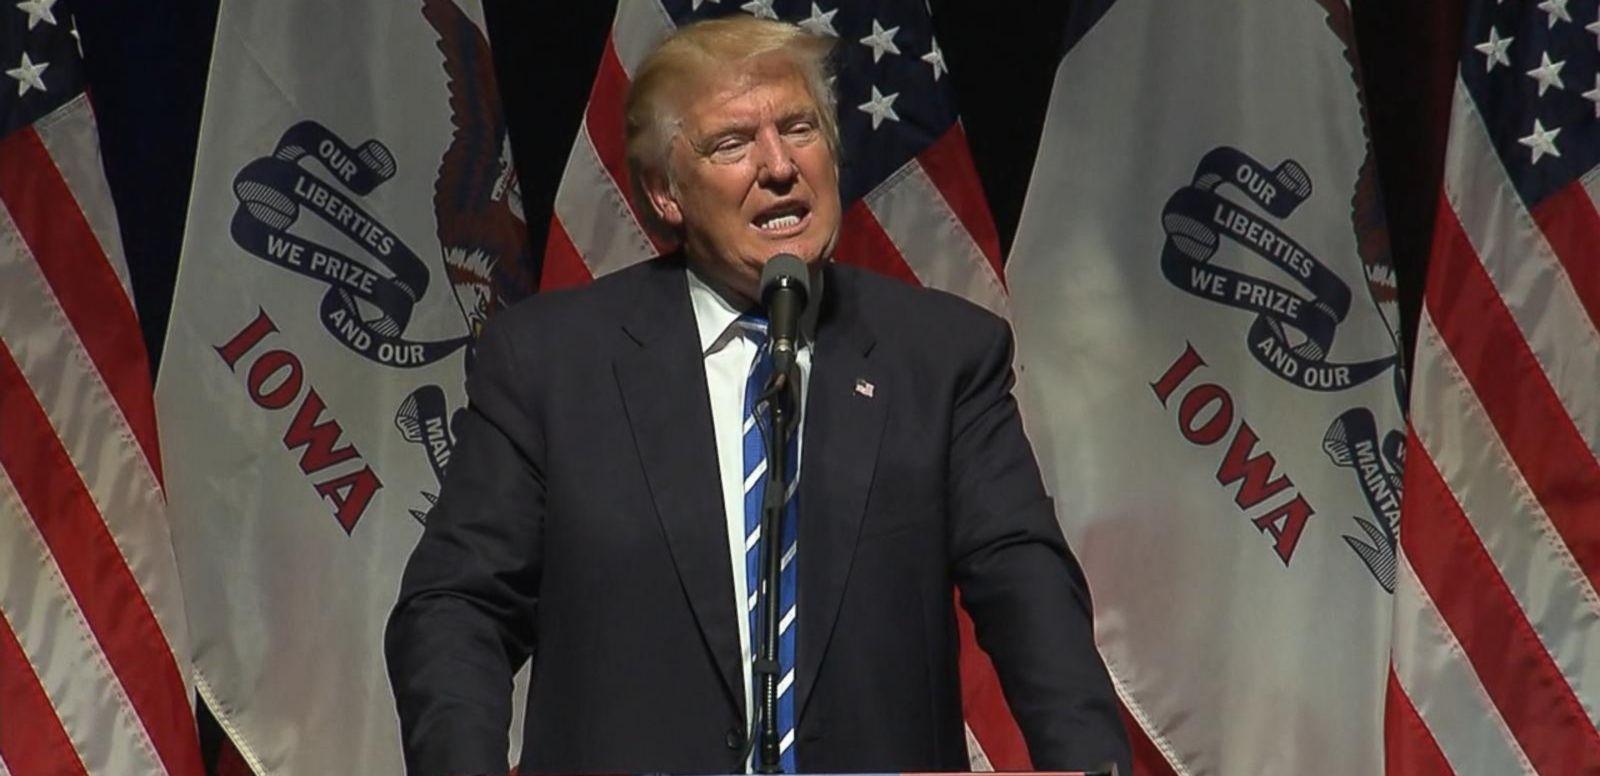 Trump spoke to supporters today in Davenport, Iowa.